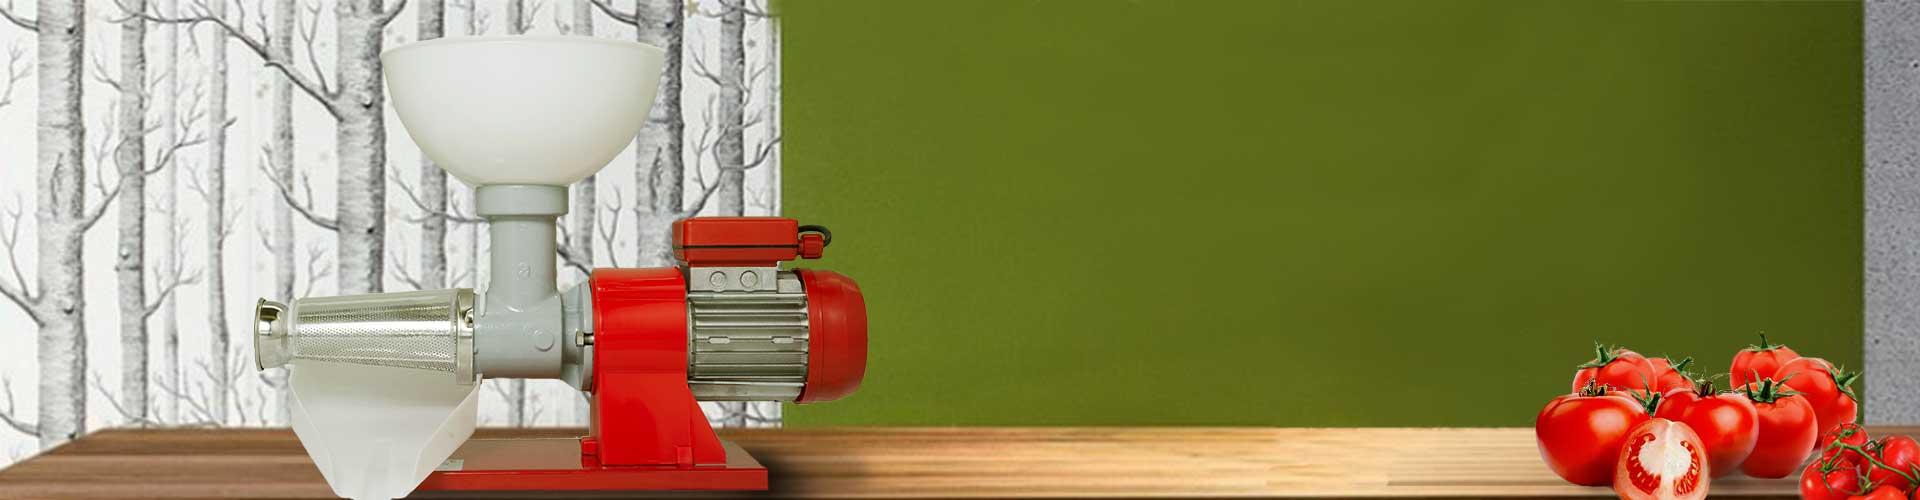 electric-tomato-machine-n3-sp3el-grifo-marchetti-enology-machines-wallpaper